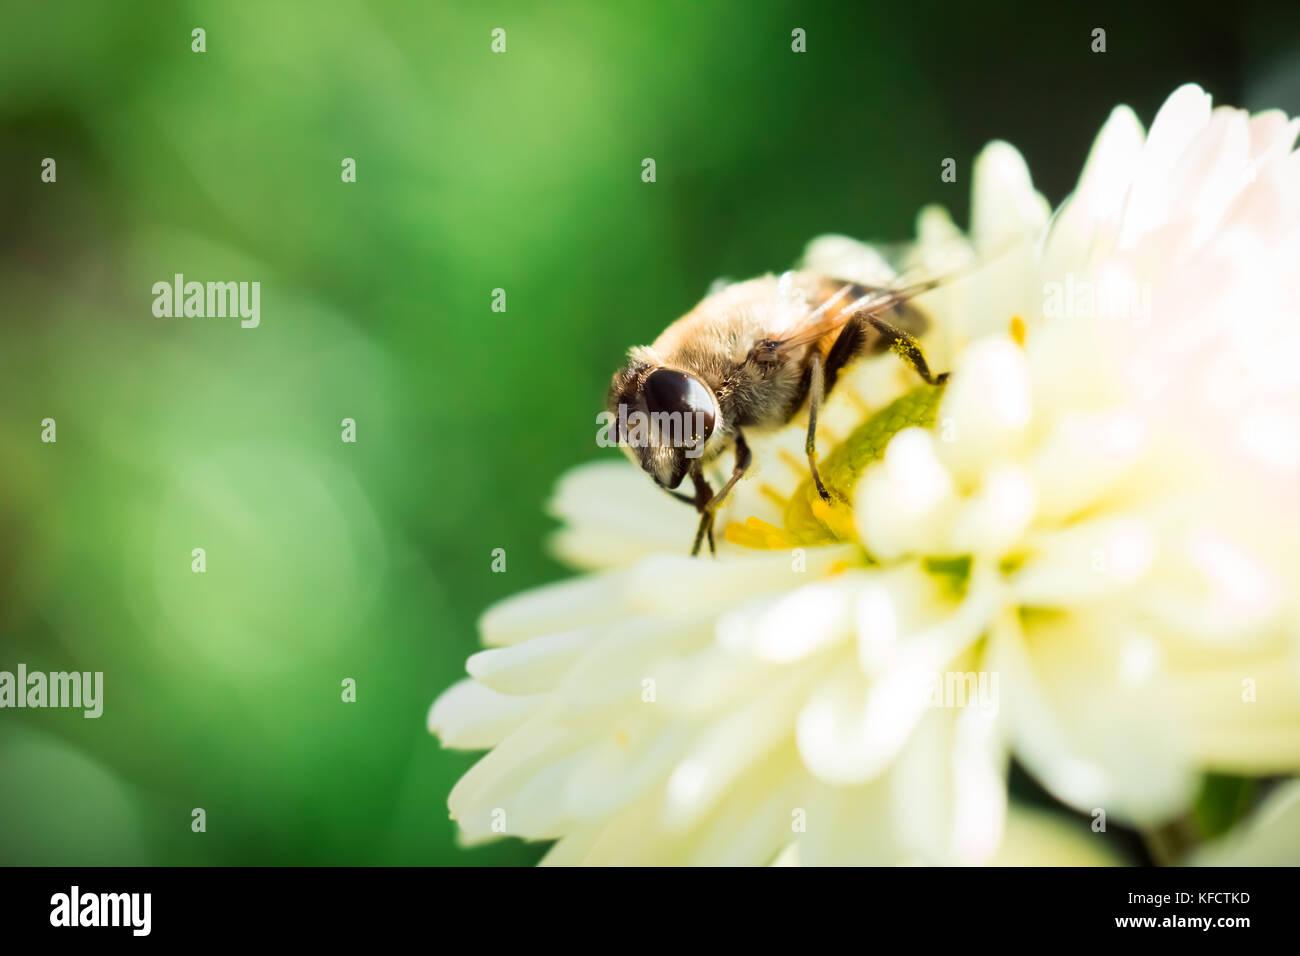 Bee diaries - Stock Image